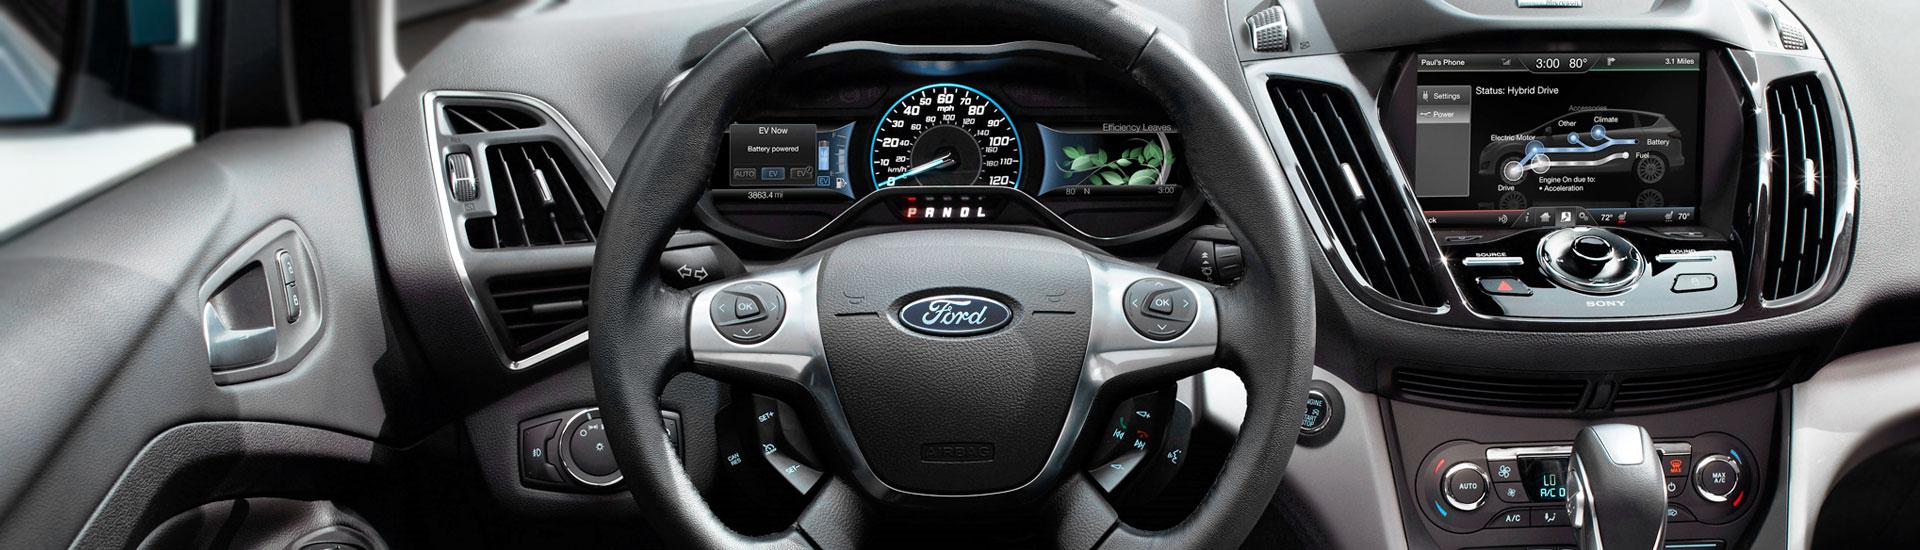 Ford c max custom dash kits